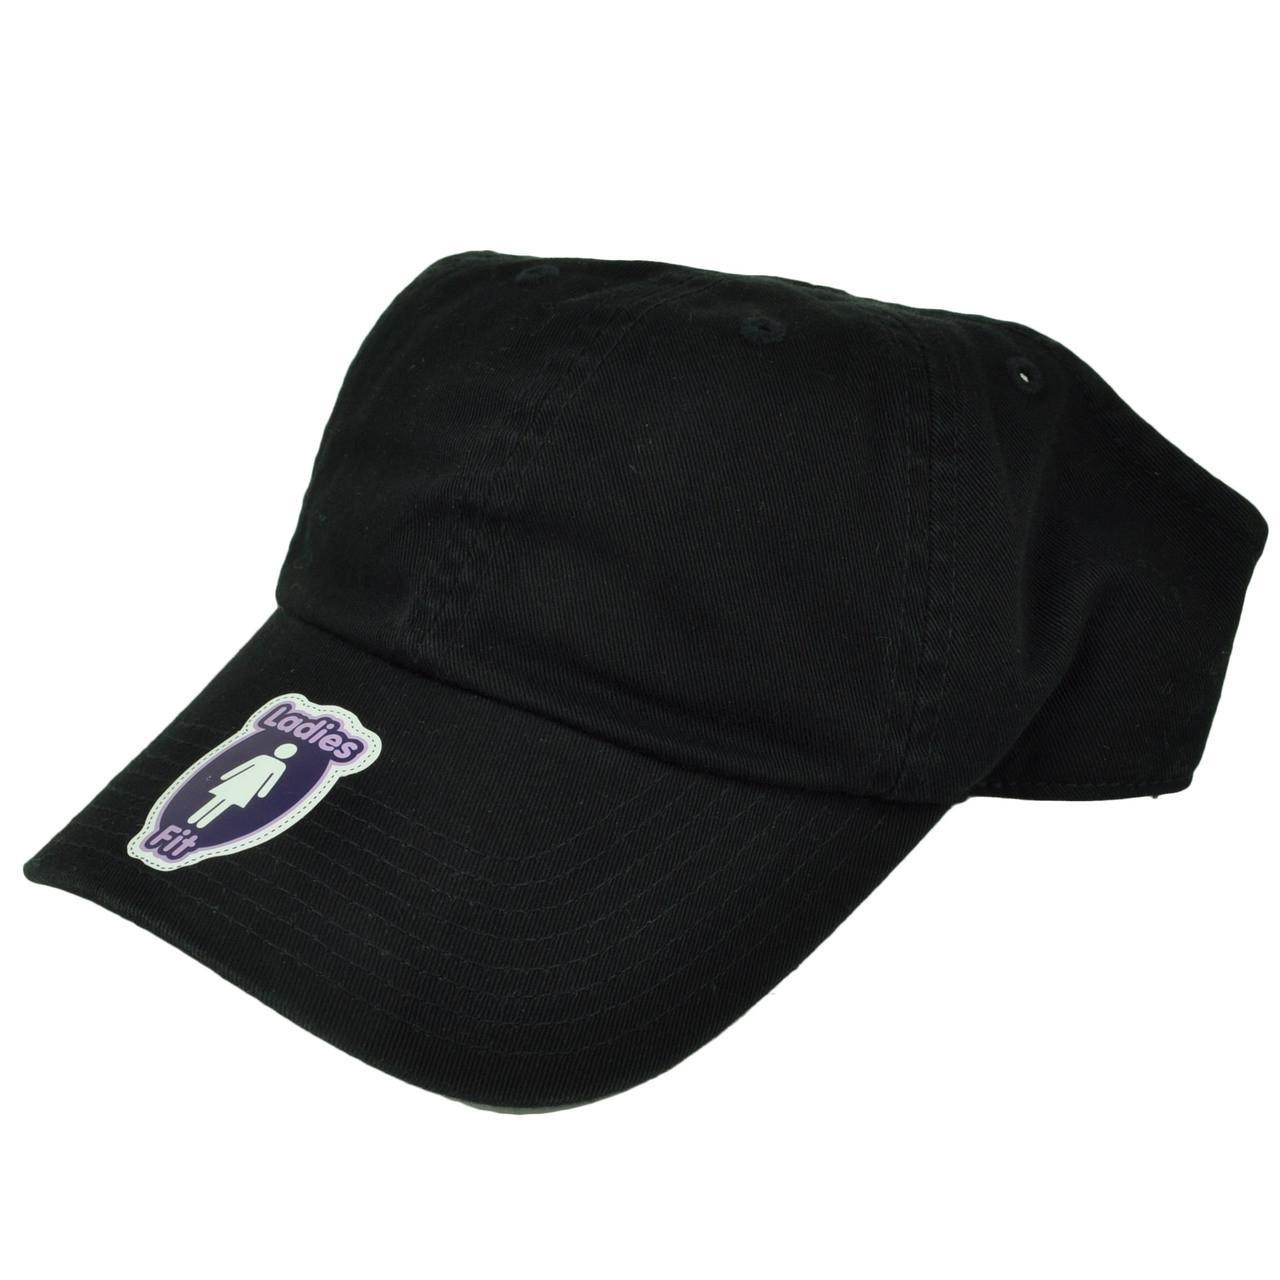 American Needle Black Open Back Hat Cap Visor Womens Ladies Velcro ... 1a3f8378ff6